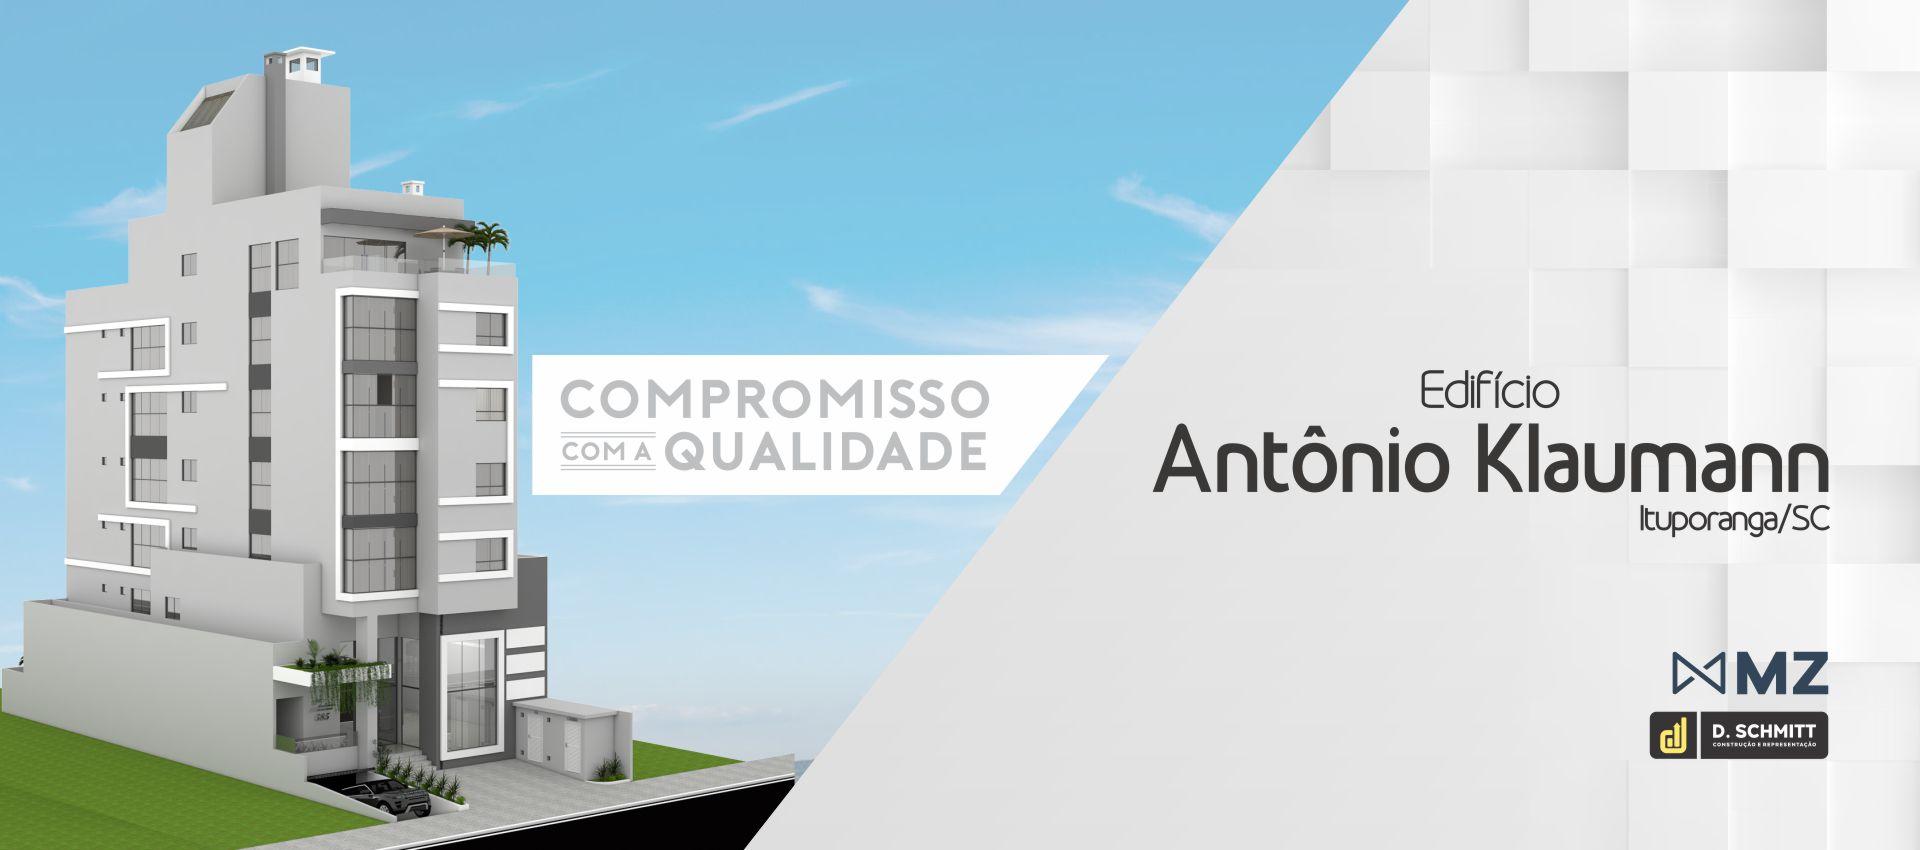 Edifício Antônio Klauman